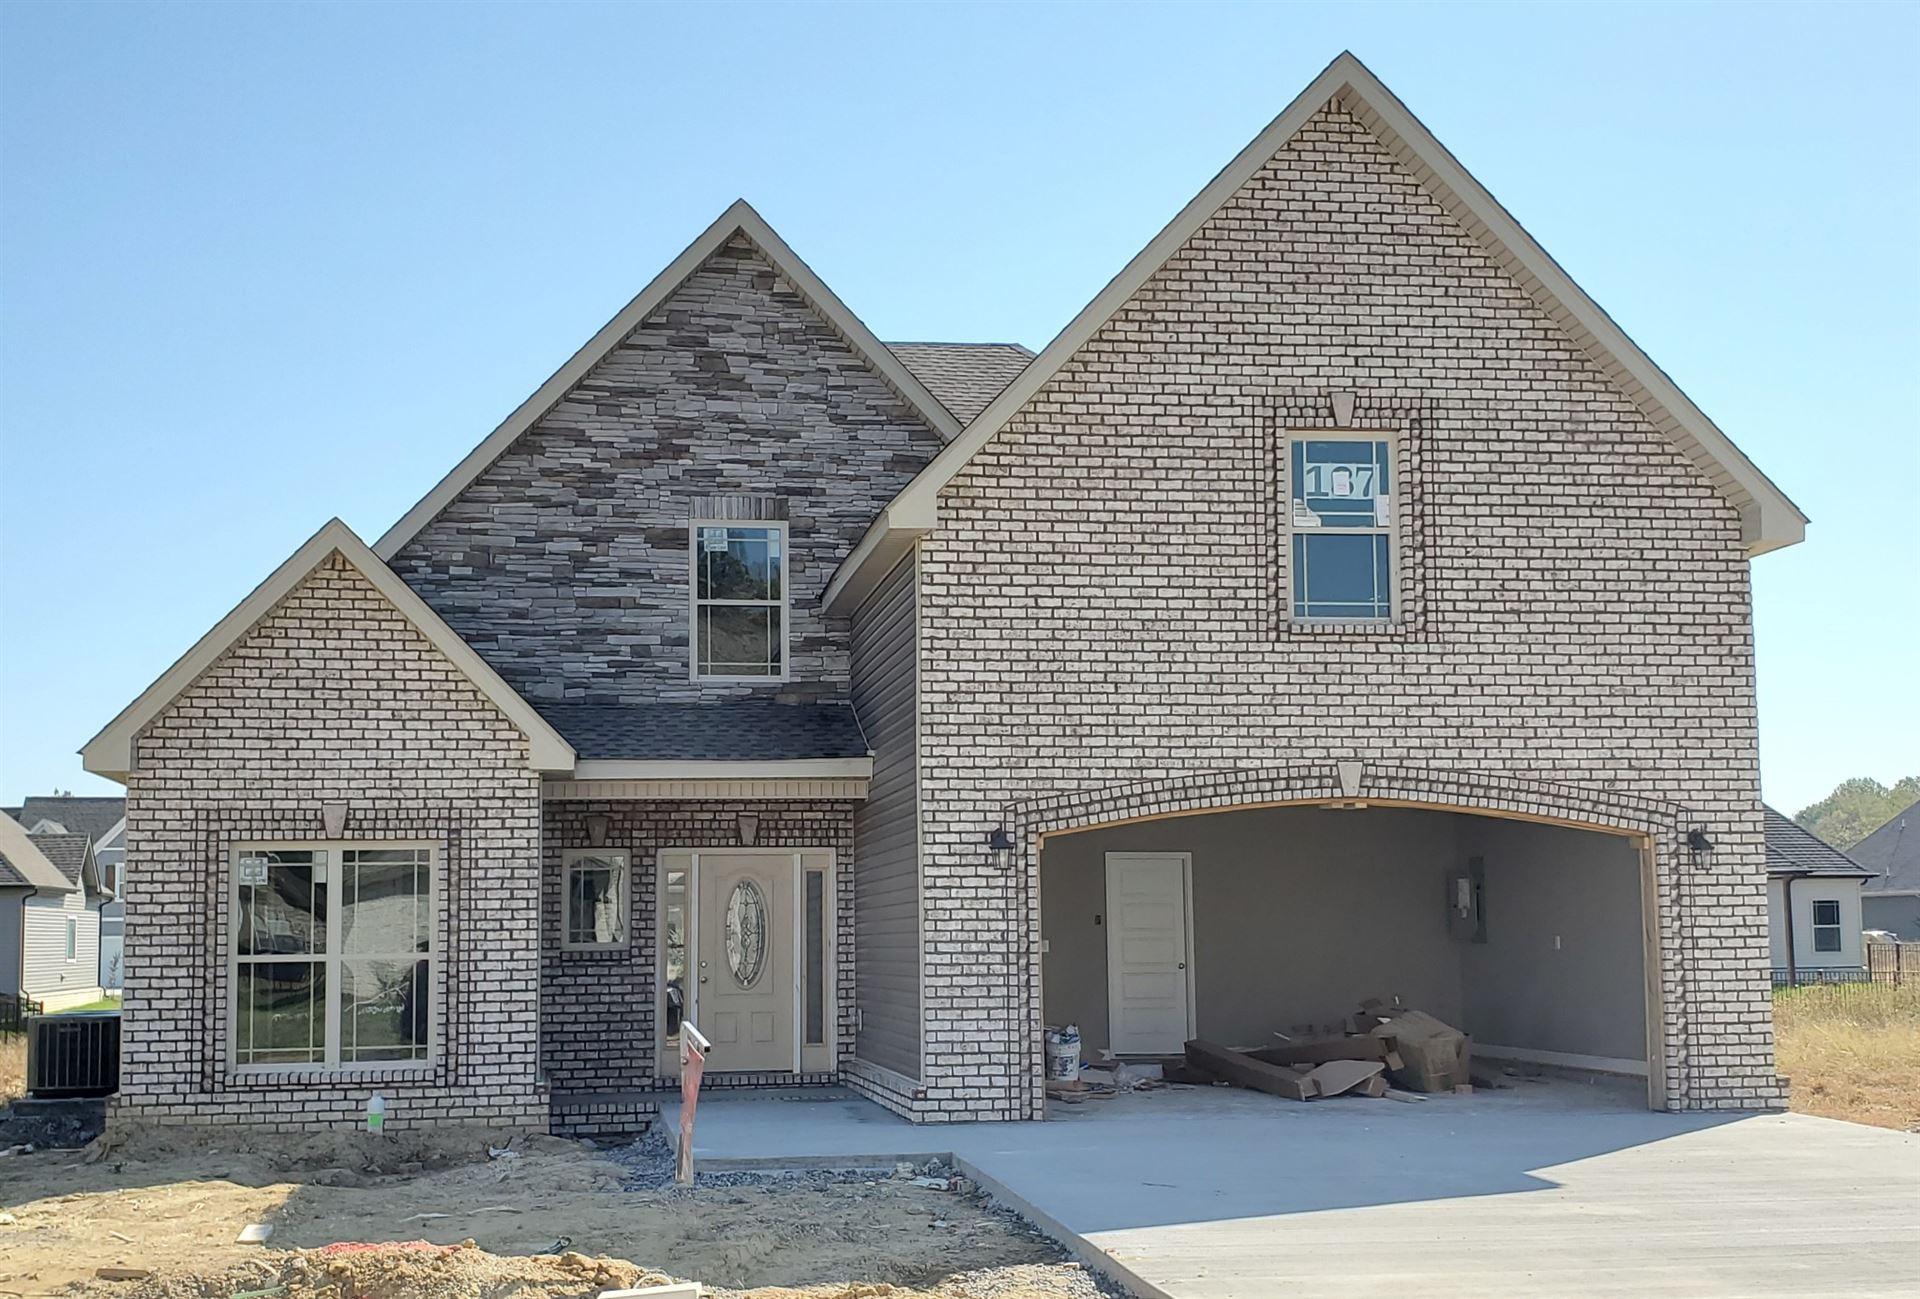 137 Easthaven, Clarksville, TN 37043 - MLS#: 2181722